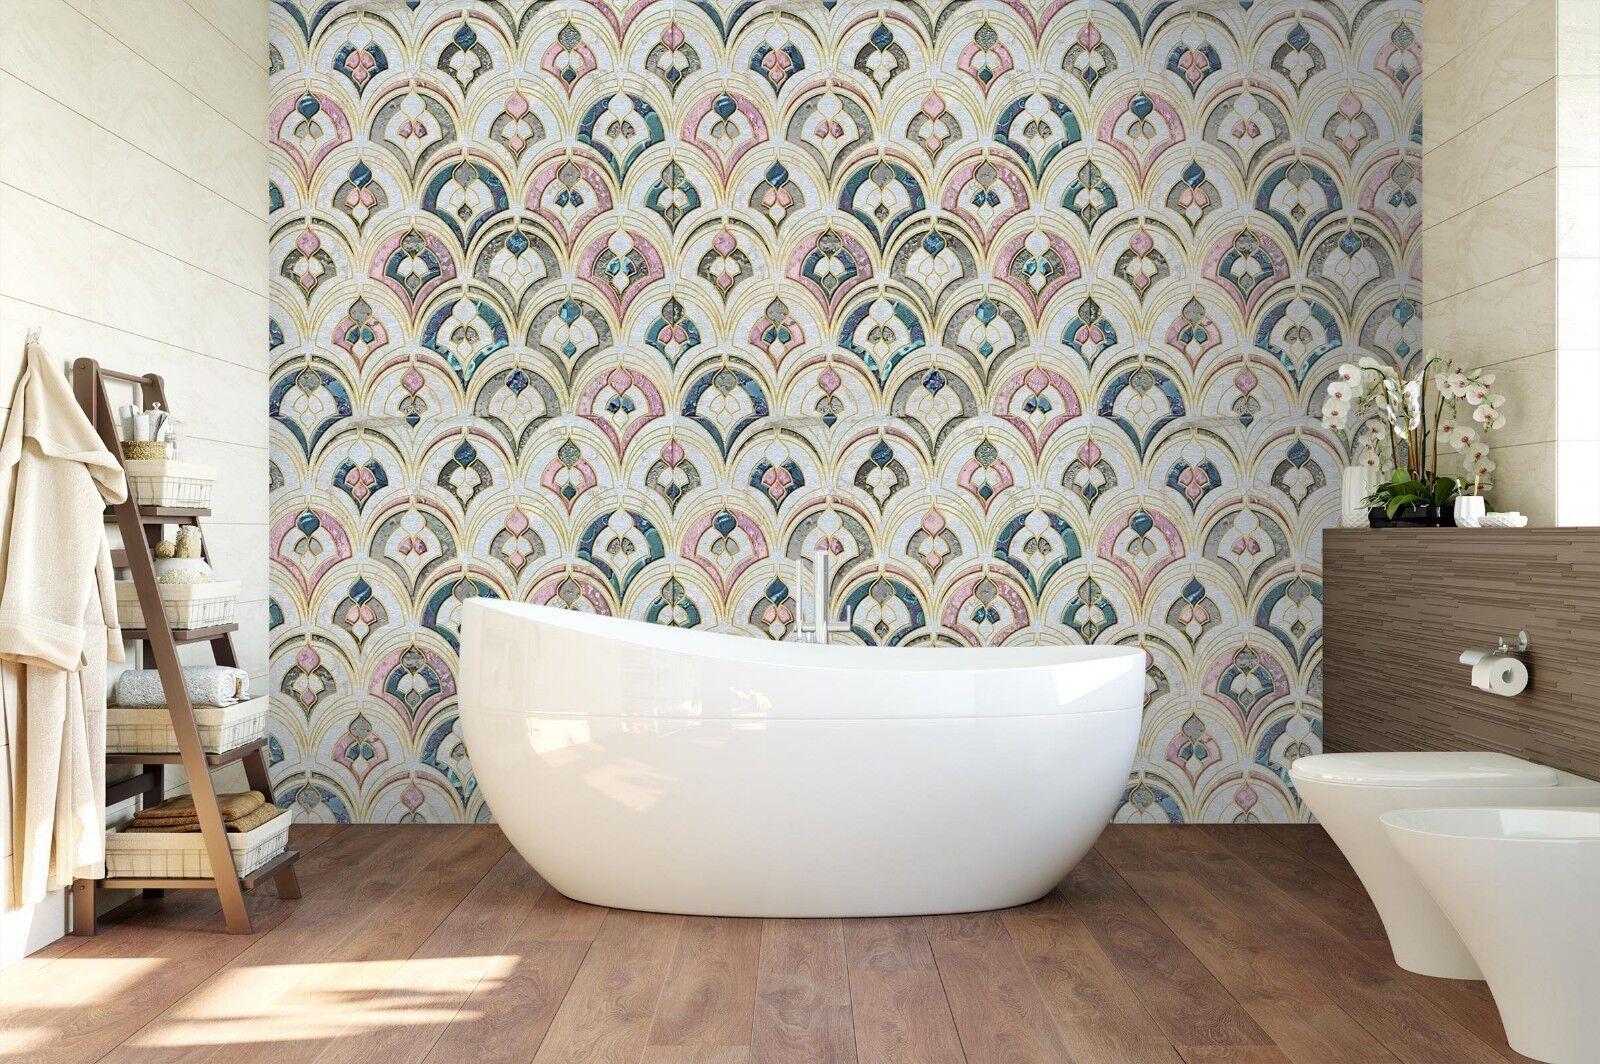 3D Umbrella Pattern 523 Texture Tiles Marble Wall Paper Decal Wallpaper Mural